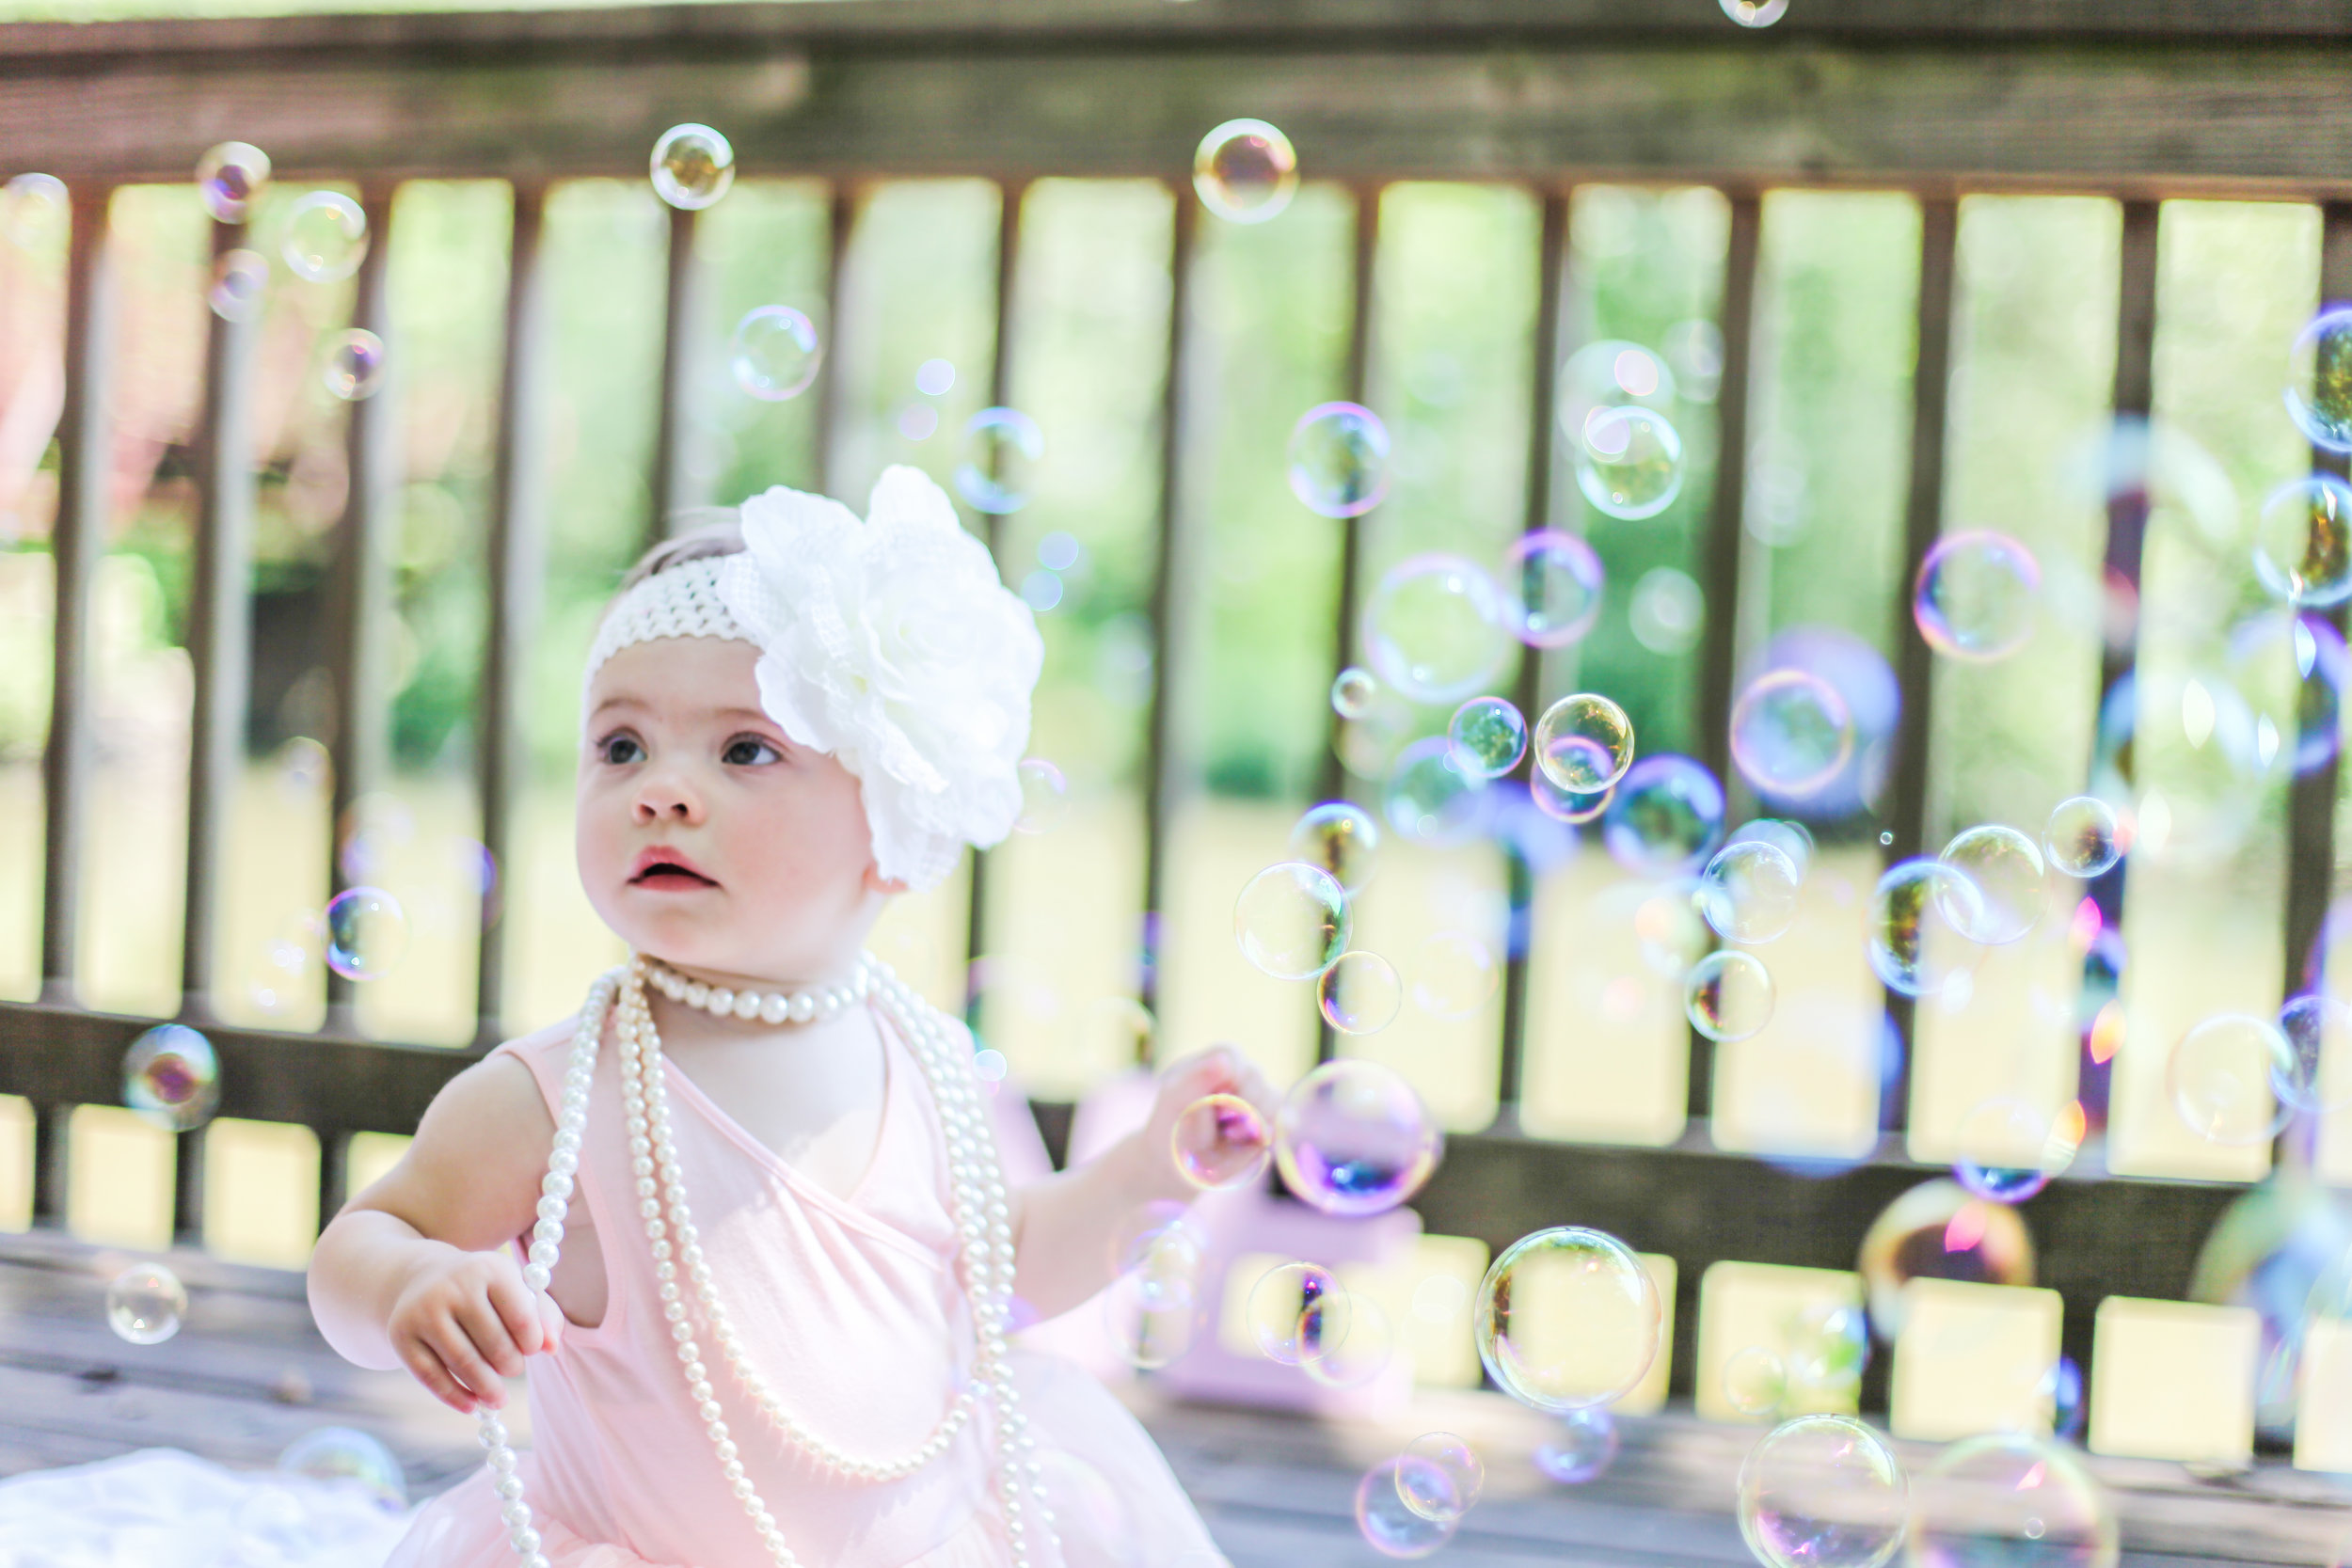 woodstock baby photography angela elliott-61.jpg